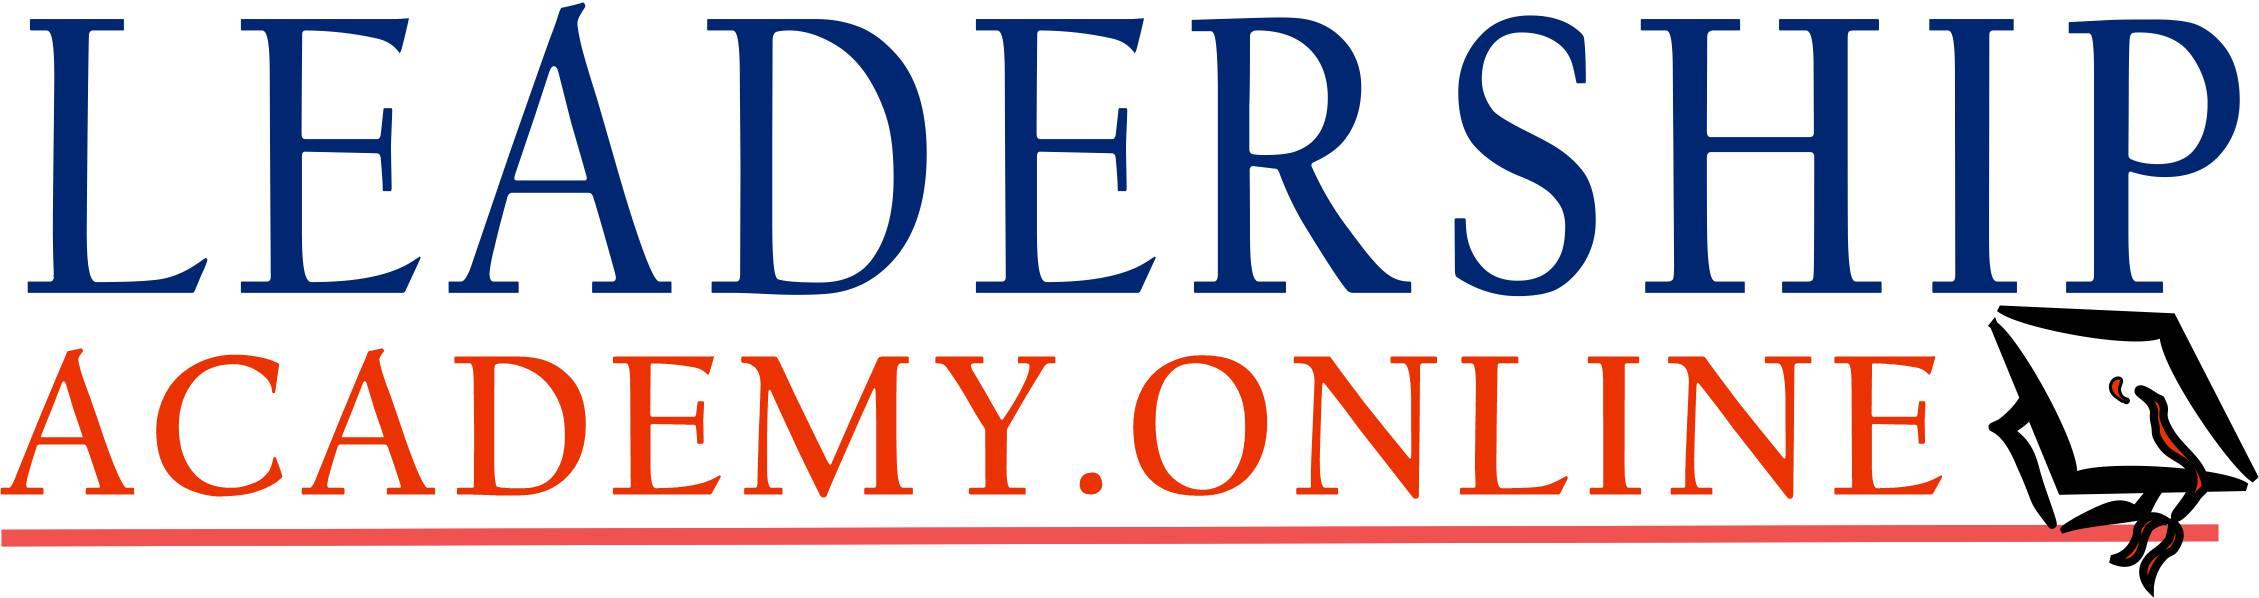 Leadership-Academy.online